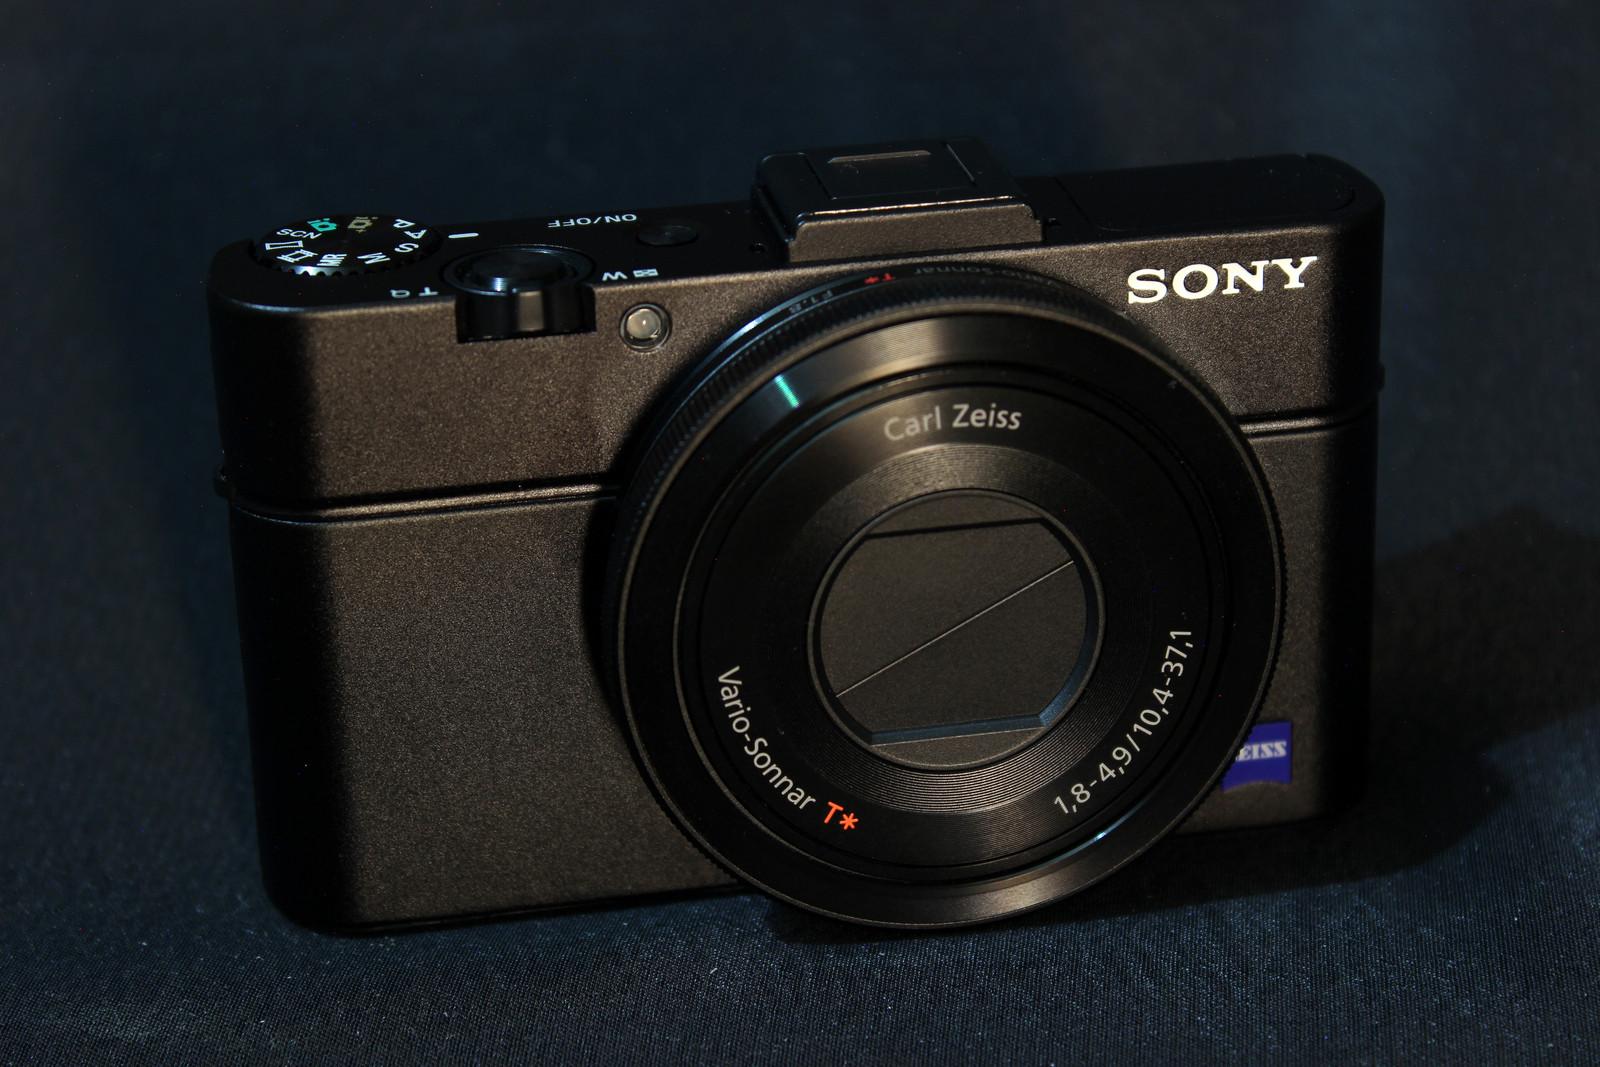 Sony cyber shot programa baixar fotos 28